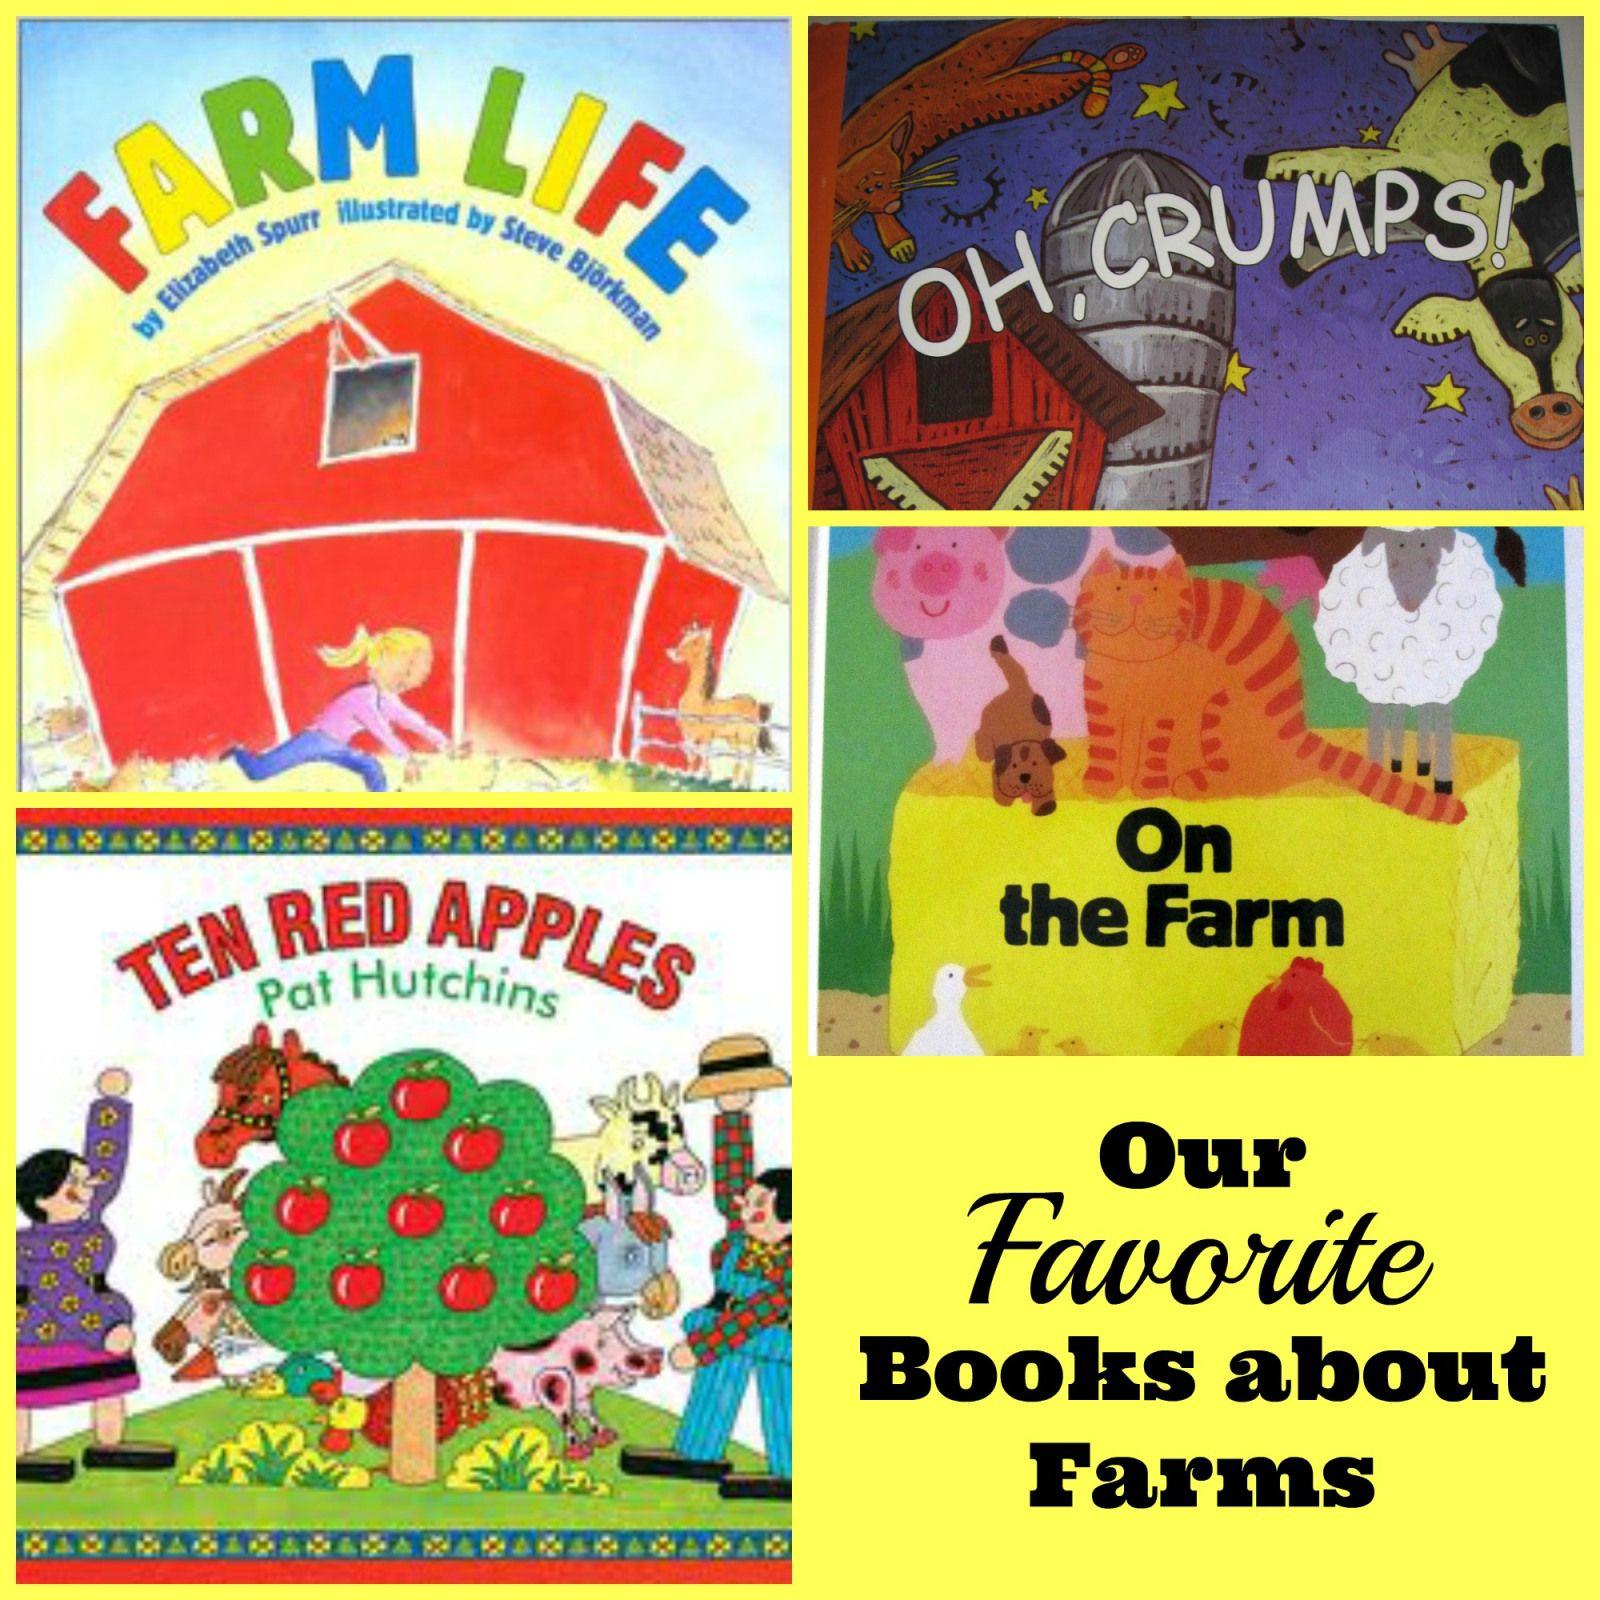 Our Favorite Farm Books